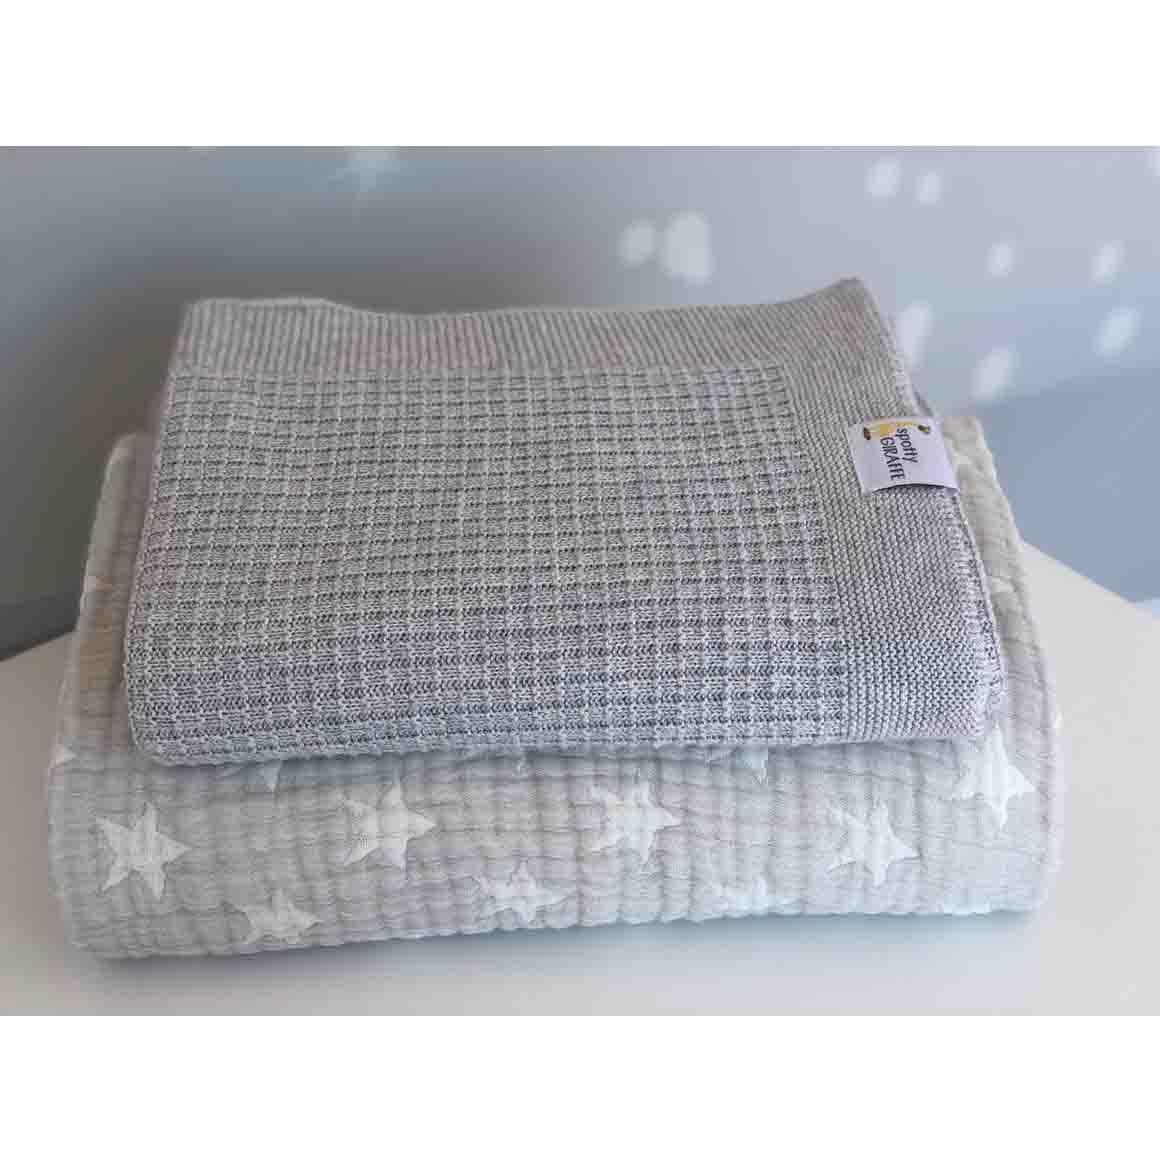 Spotty Giraffe Silk/Linen/Cotton Pram/Bassinette Blanket  | Trada Marketplace